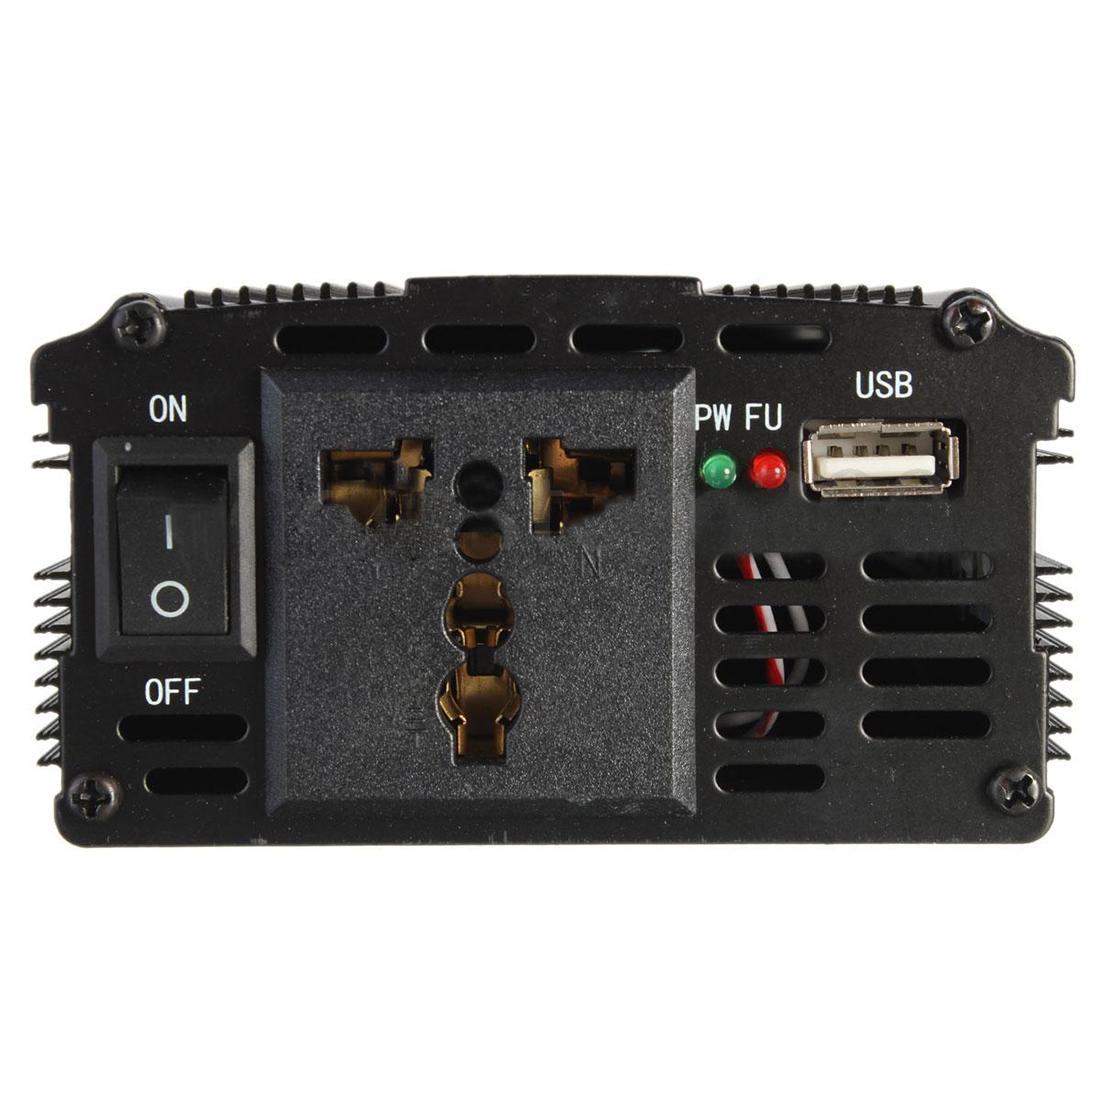 w453 xuyuan 2000w car vehicle usb dc 24v to ac 220v power inverter adapter conve ebay. Black Bedroom Furniture Sets. Home Design Ideas